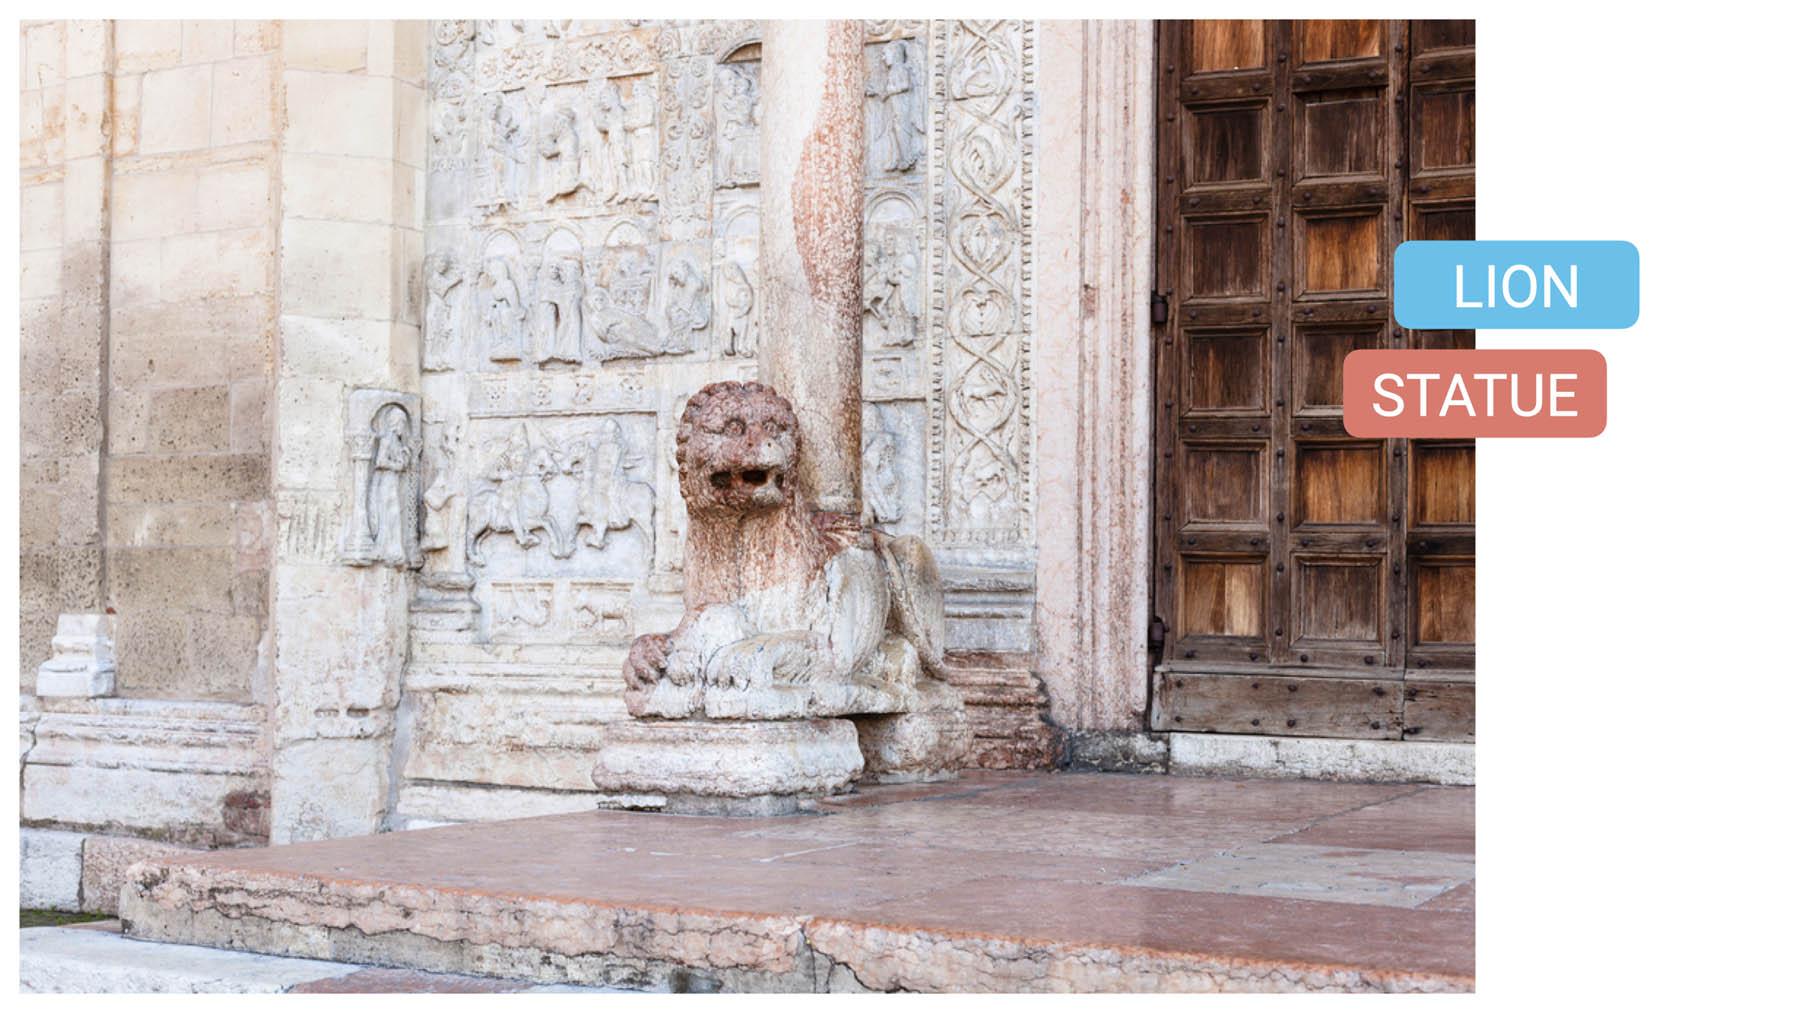 Basilica of St. Zeno lion statue verona bike tour